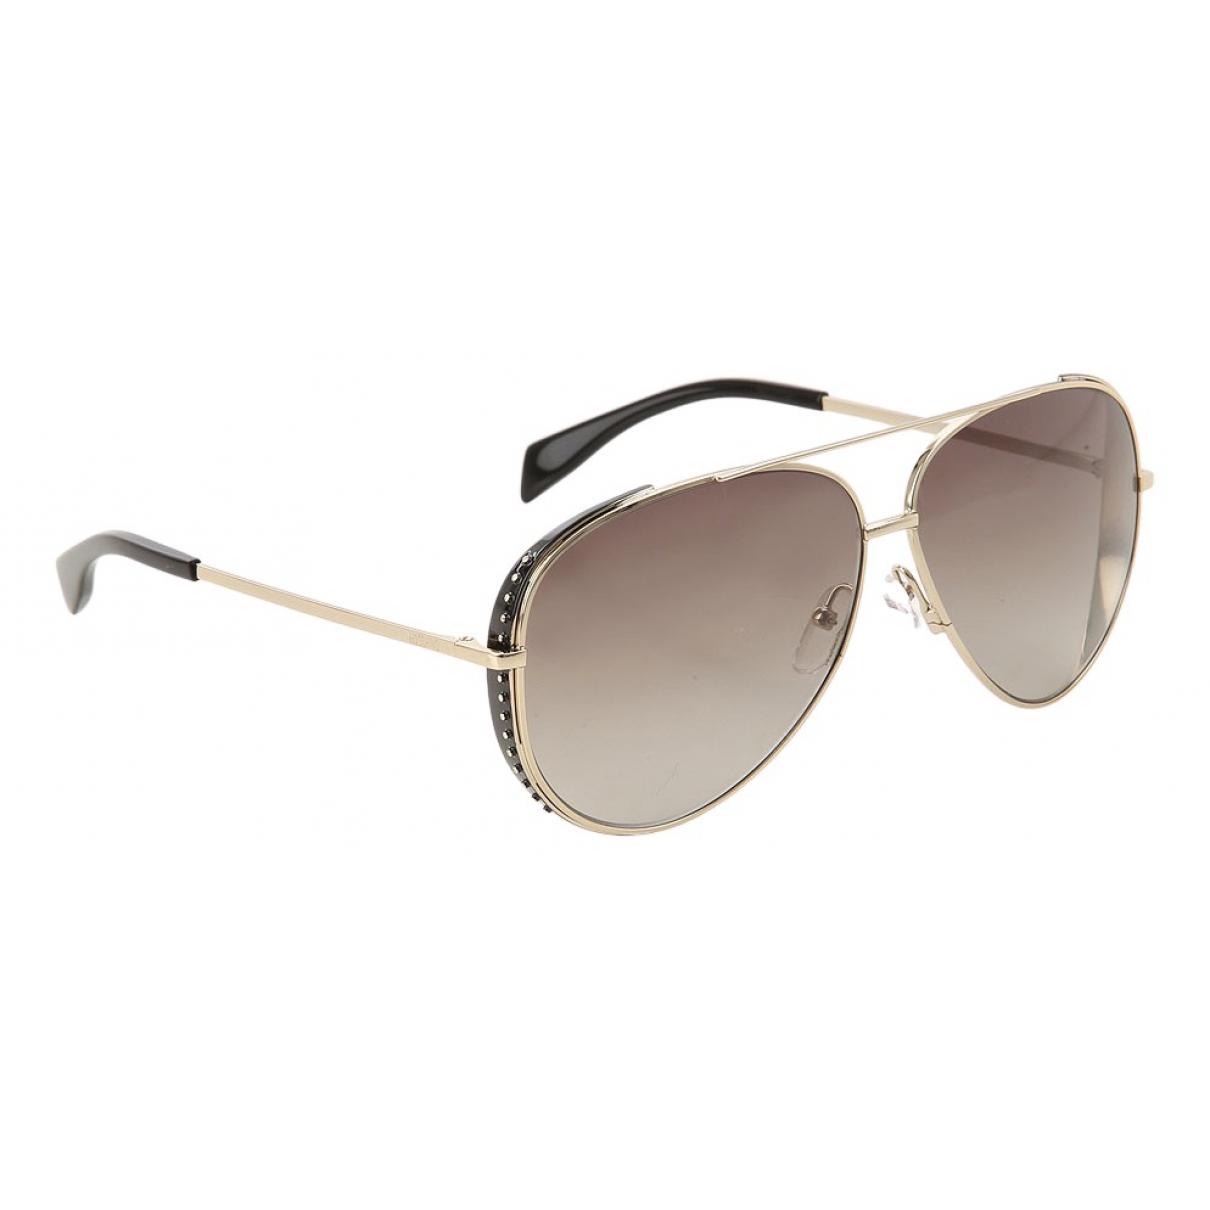 Moschino N Gold Metal Sunglasses for Women N